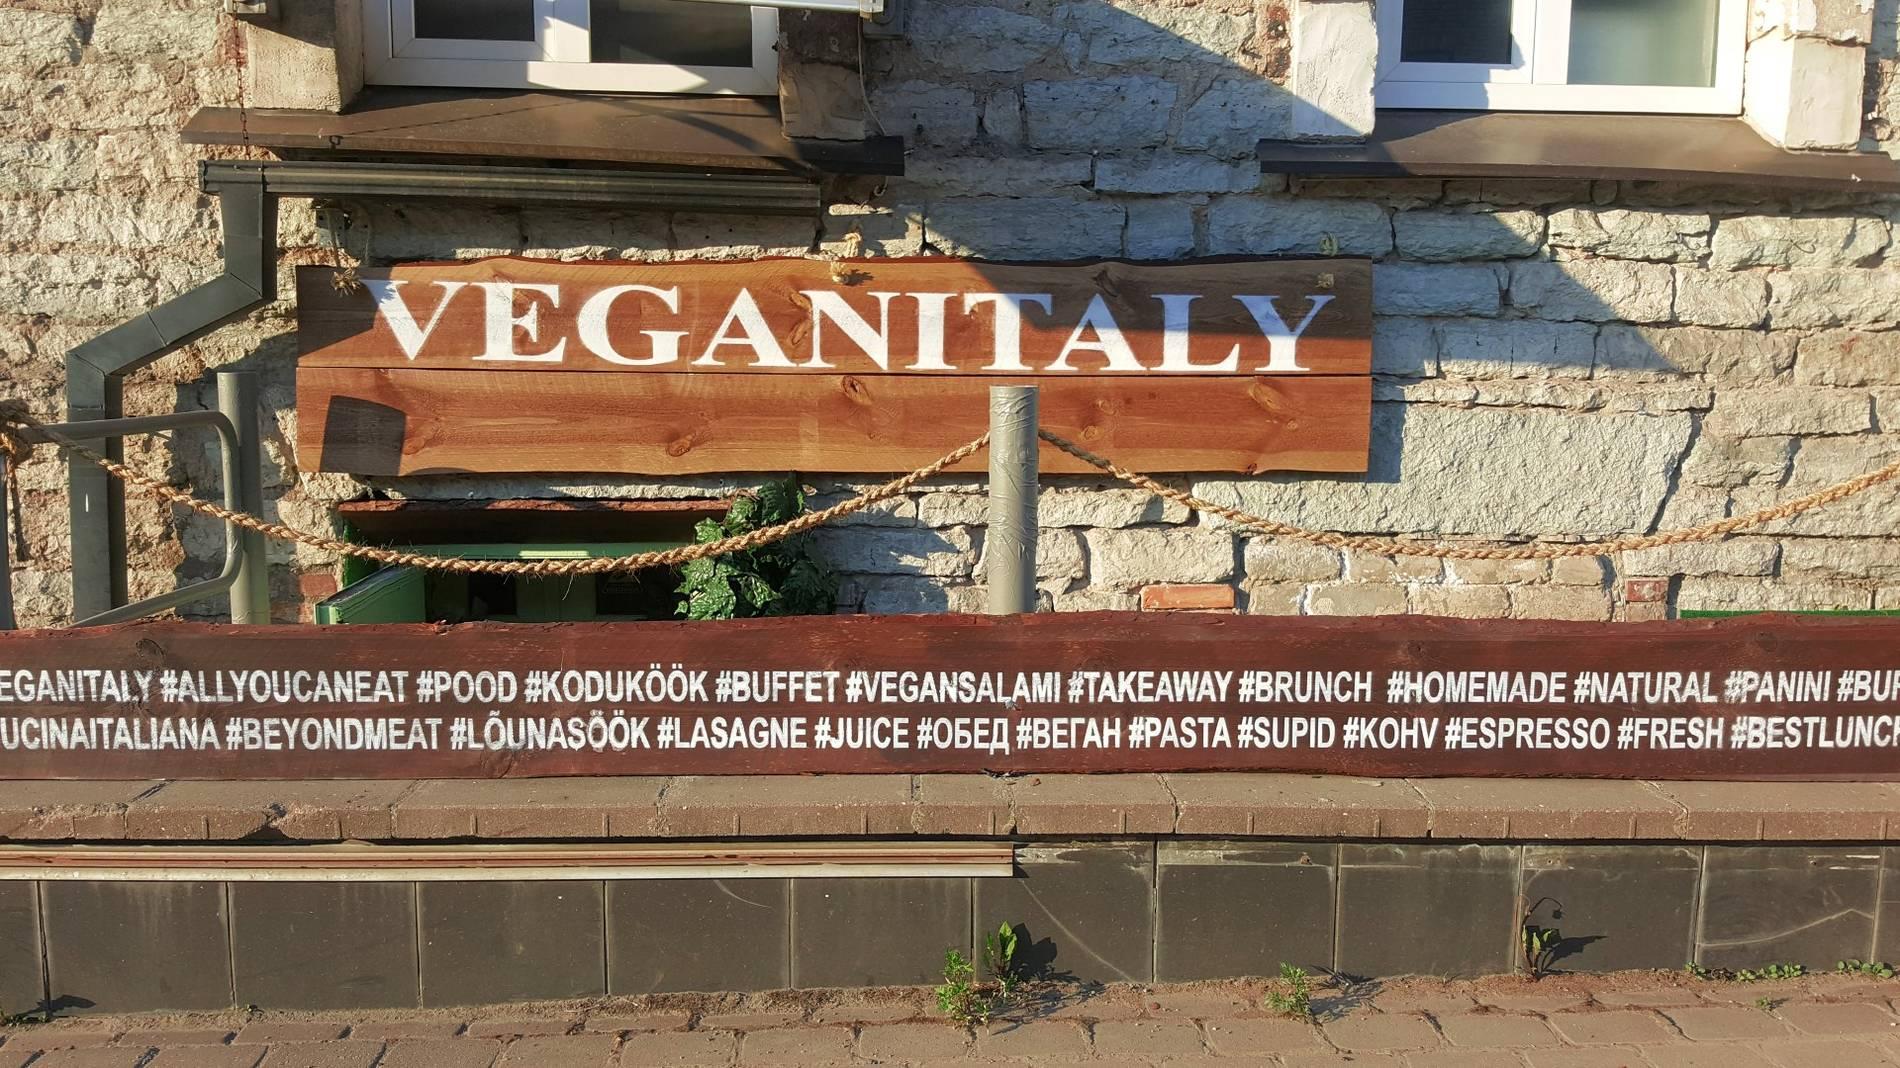 Vegan Italy in Tallinn, Estonia